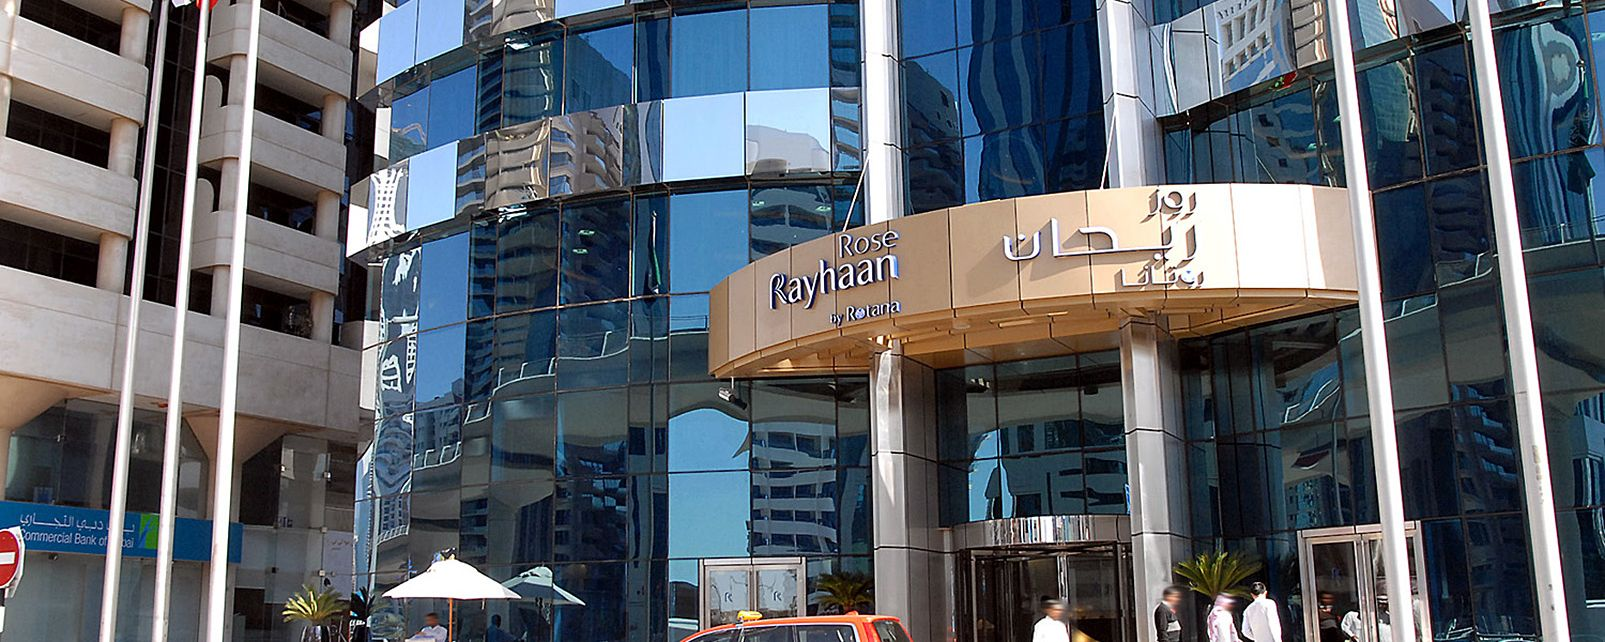 Hotel Rose Rayhaan by Rotana